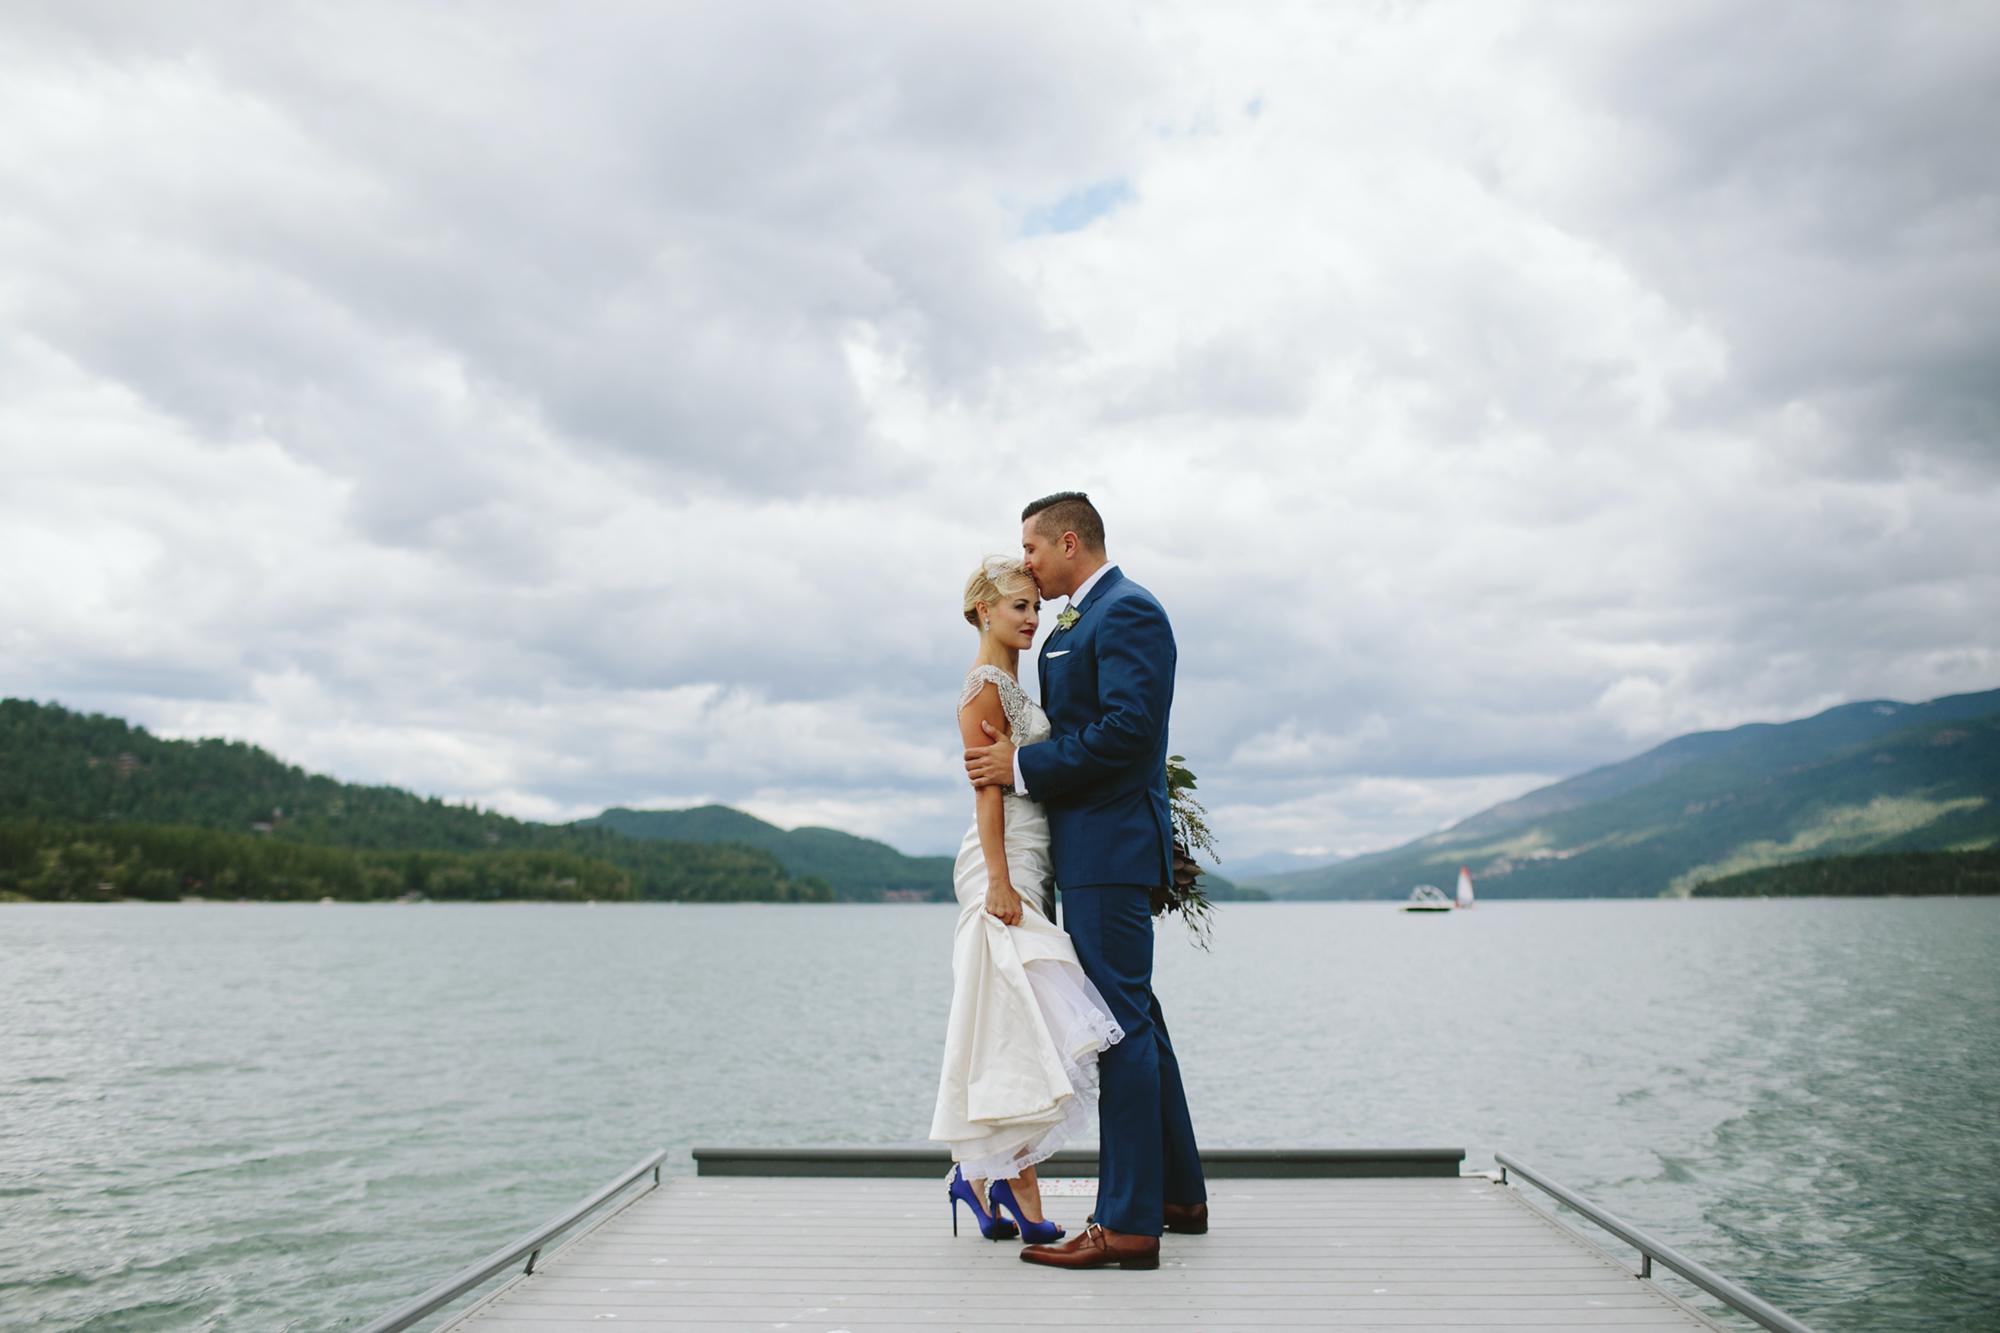 mountain wedding, lake wedding, alberta wedding photographer, vintage gown, blue heals, bride blue shoes, vintage hair